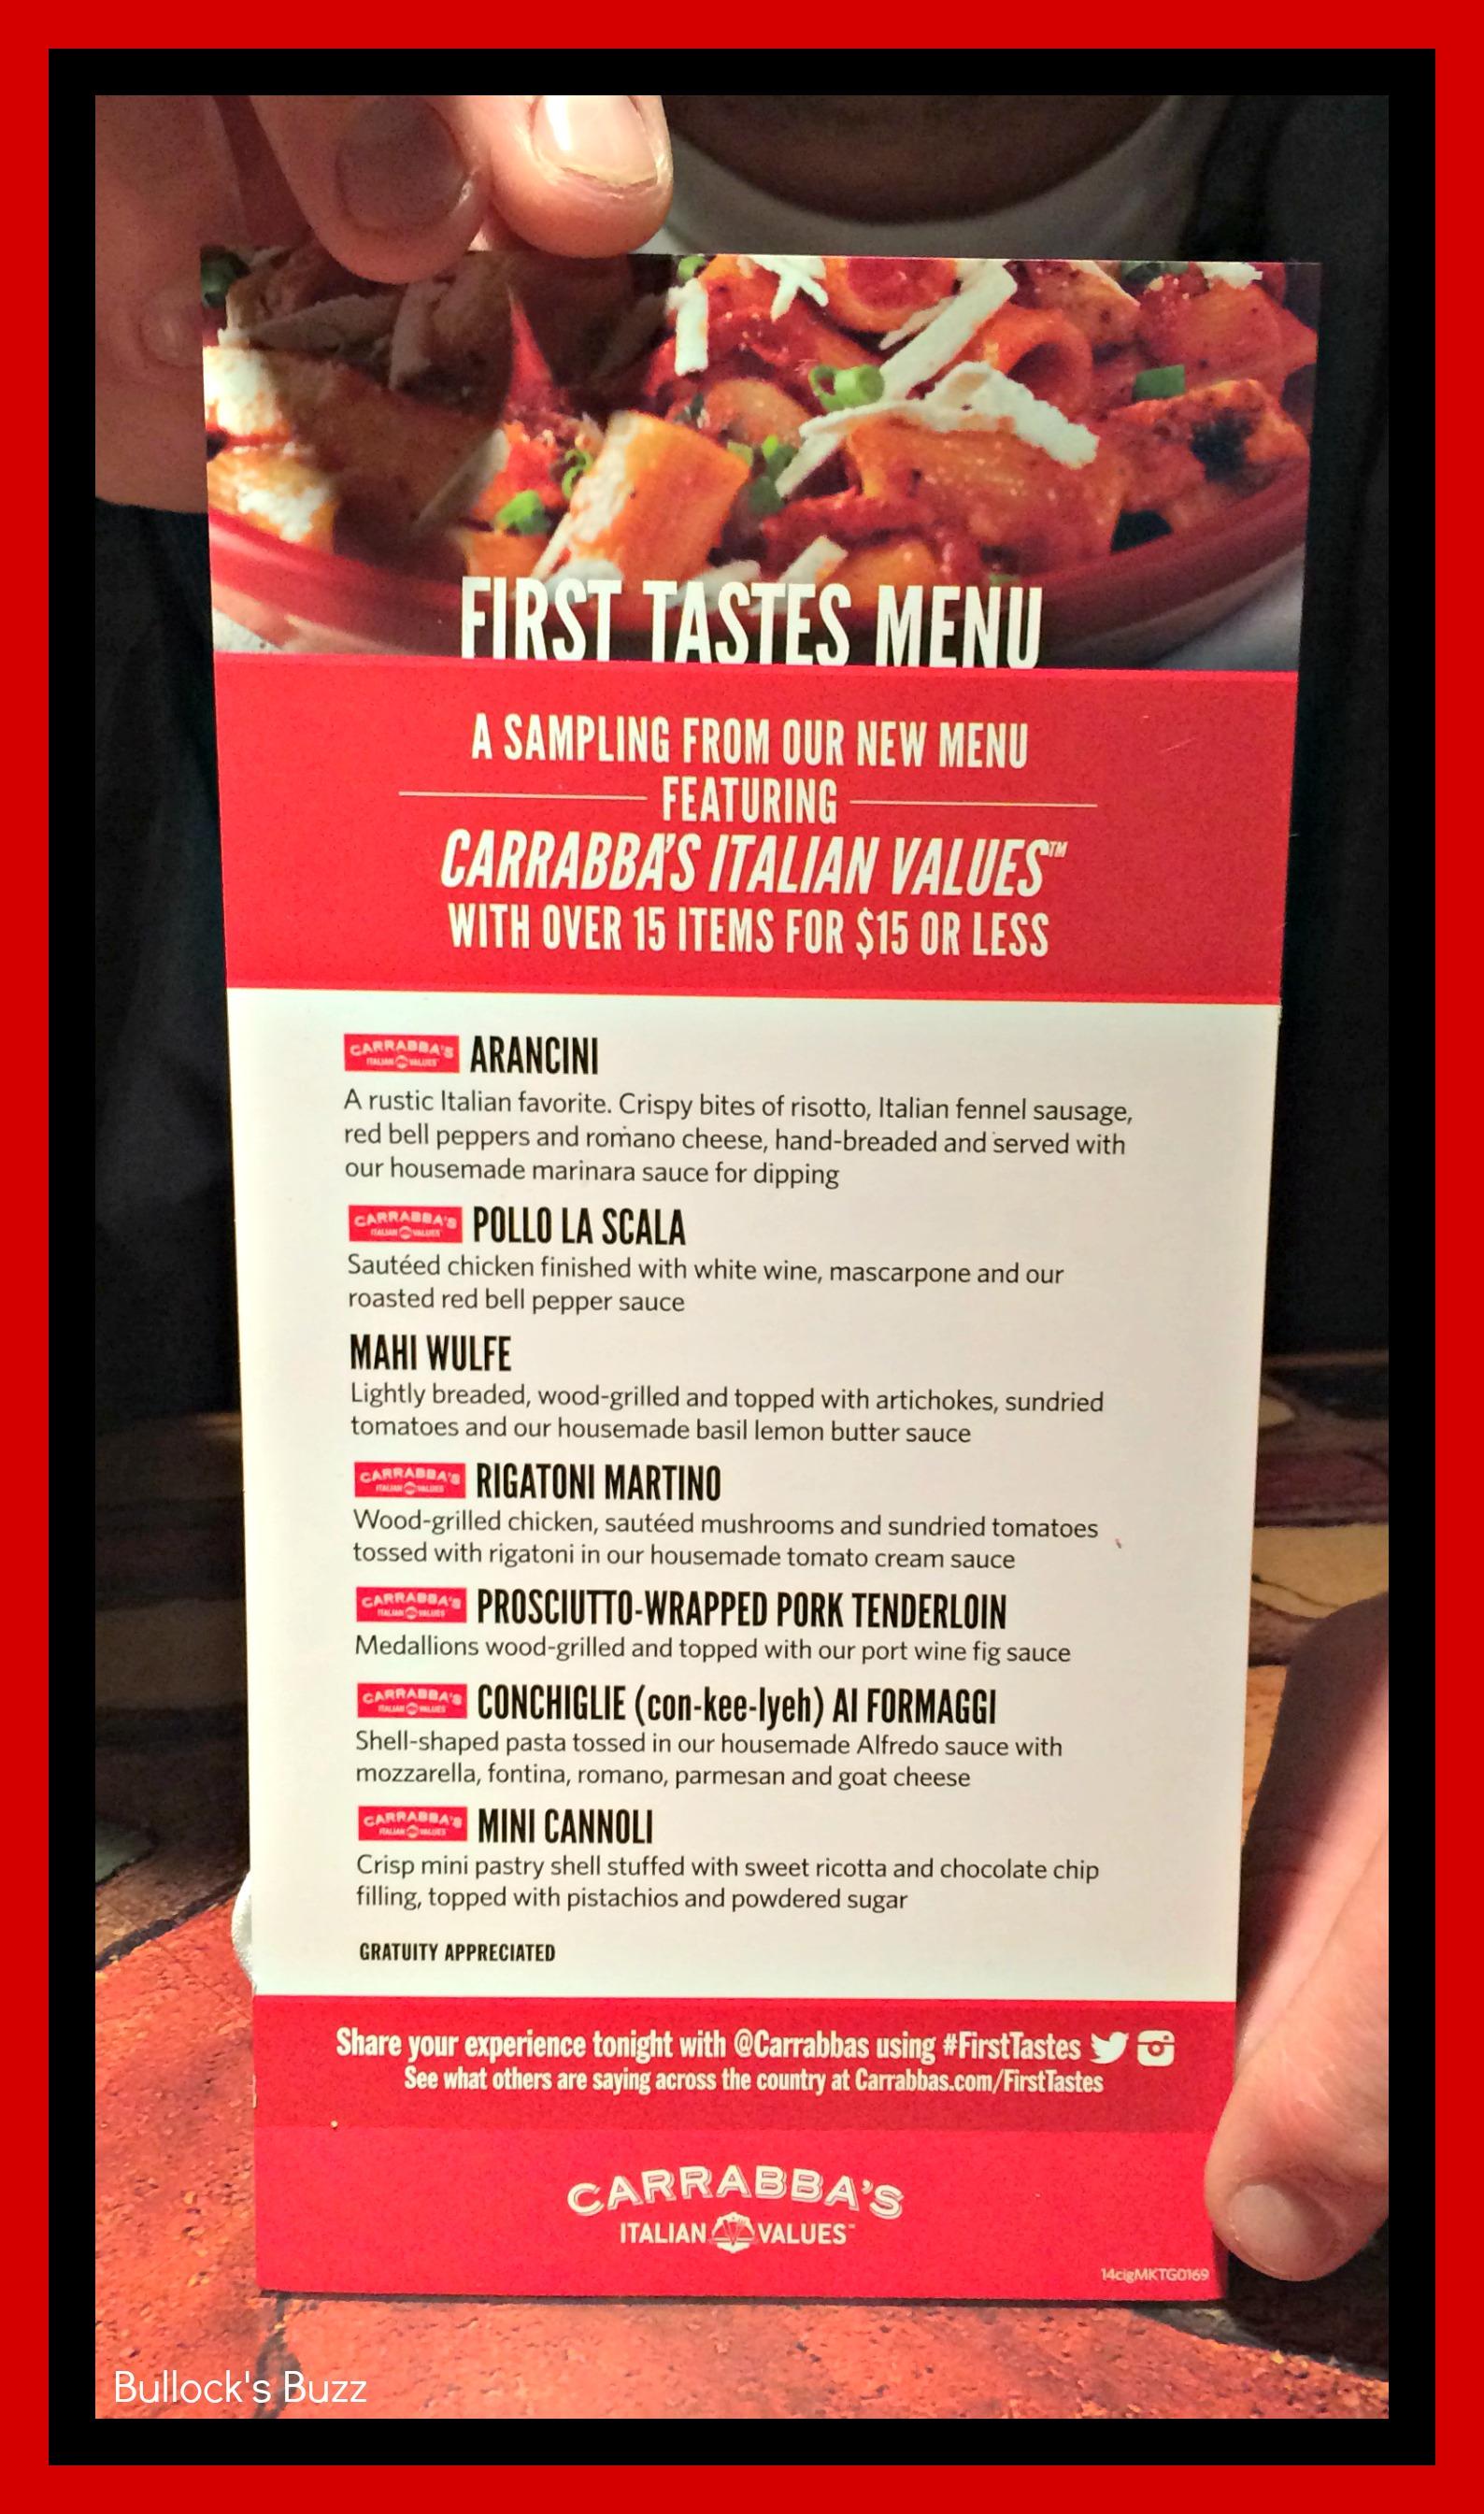 photograph about Carrabba's Printable Menu identify Carrabbas Fresh new Menu Italian Values - Around 15 Fresh Goods for